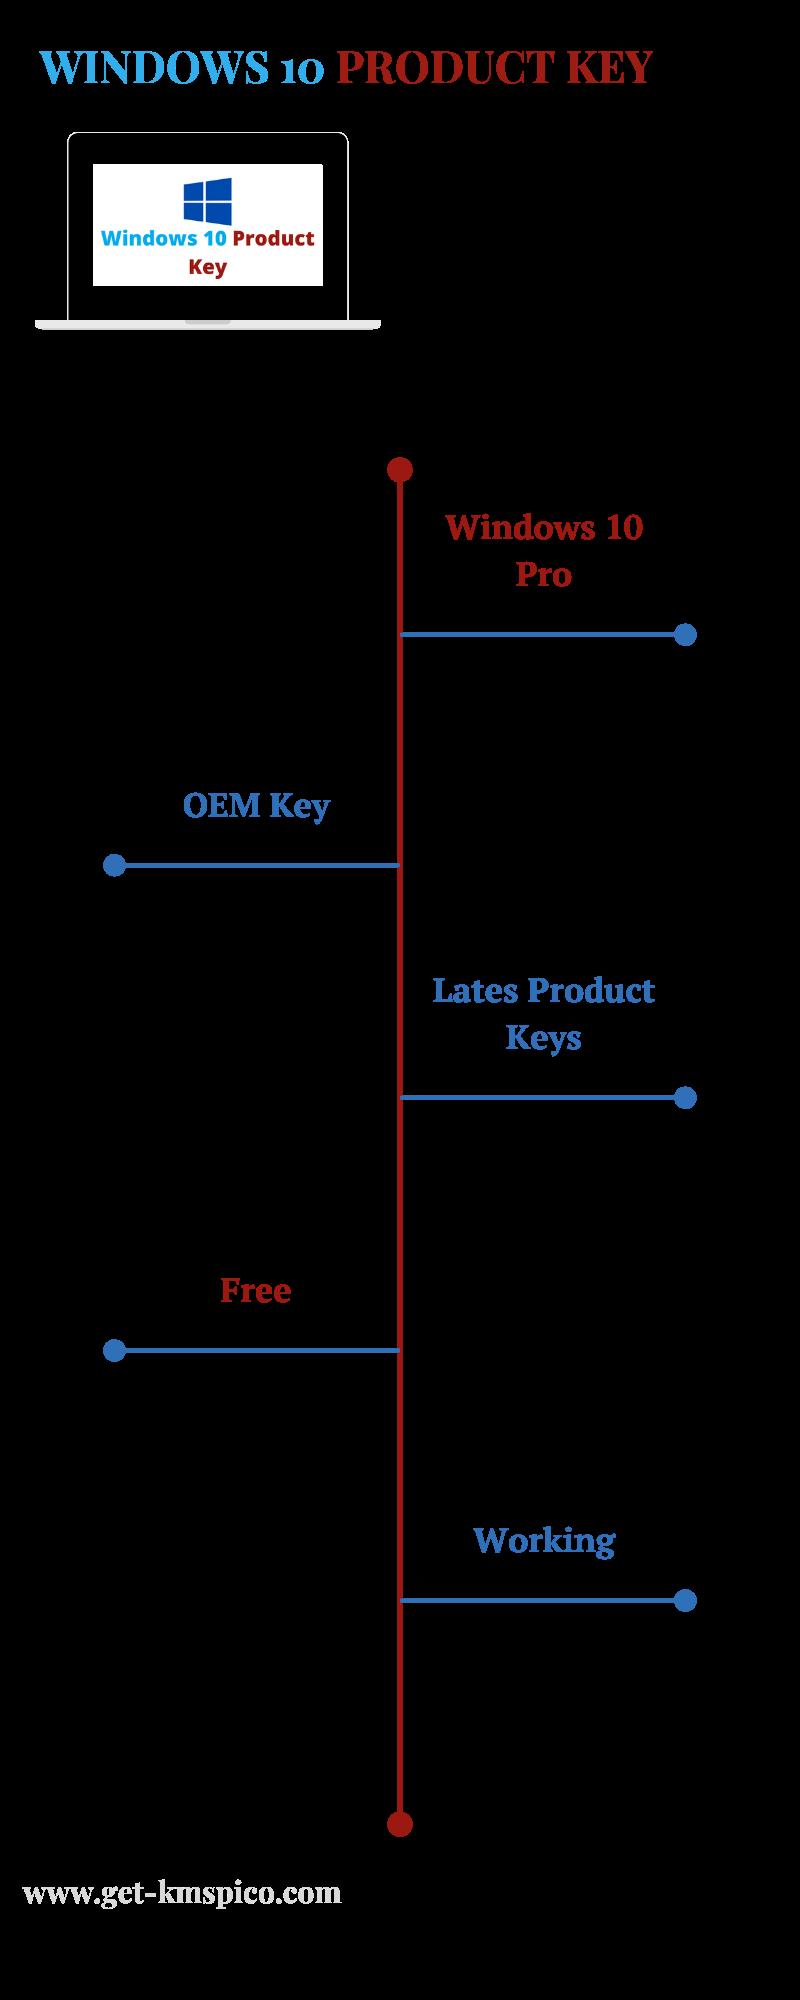 Windows-10-Product-Key-Infographic